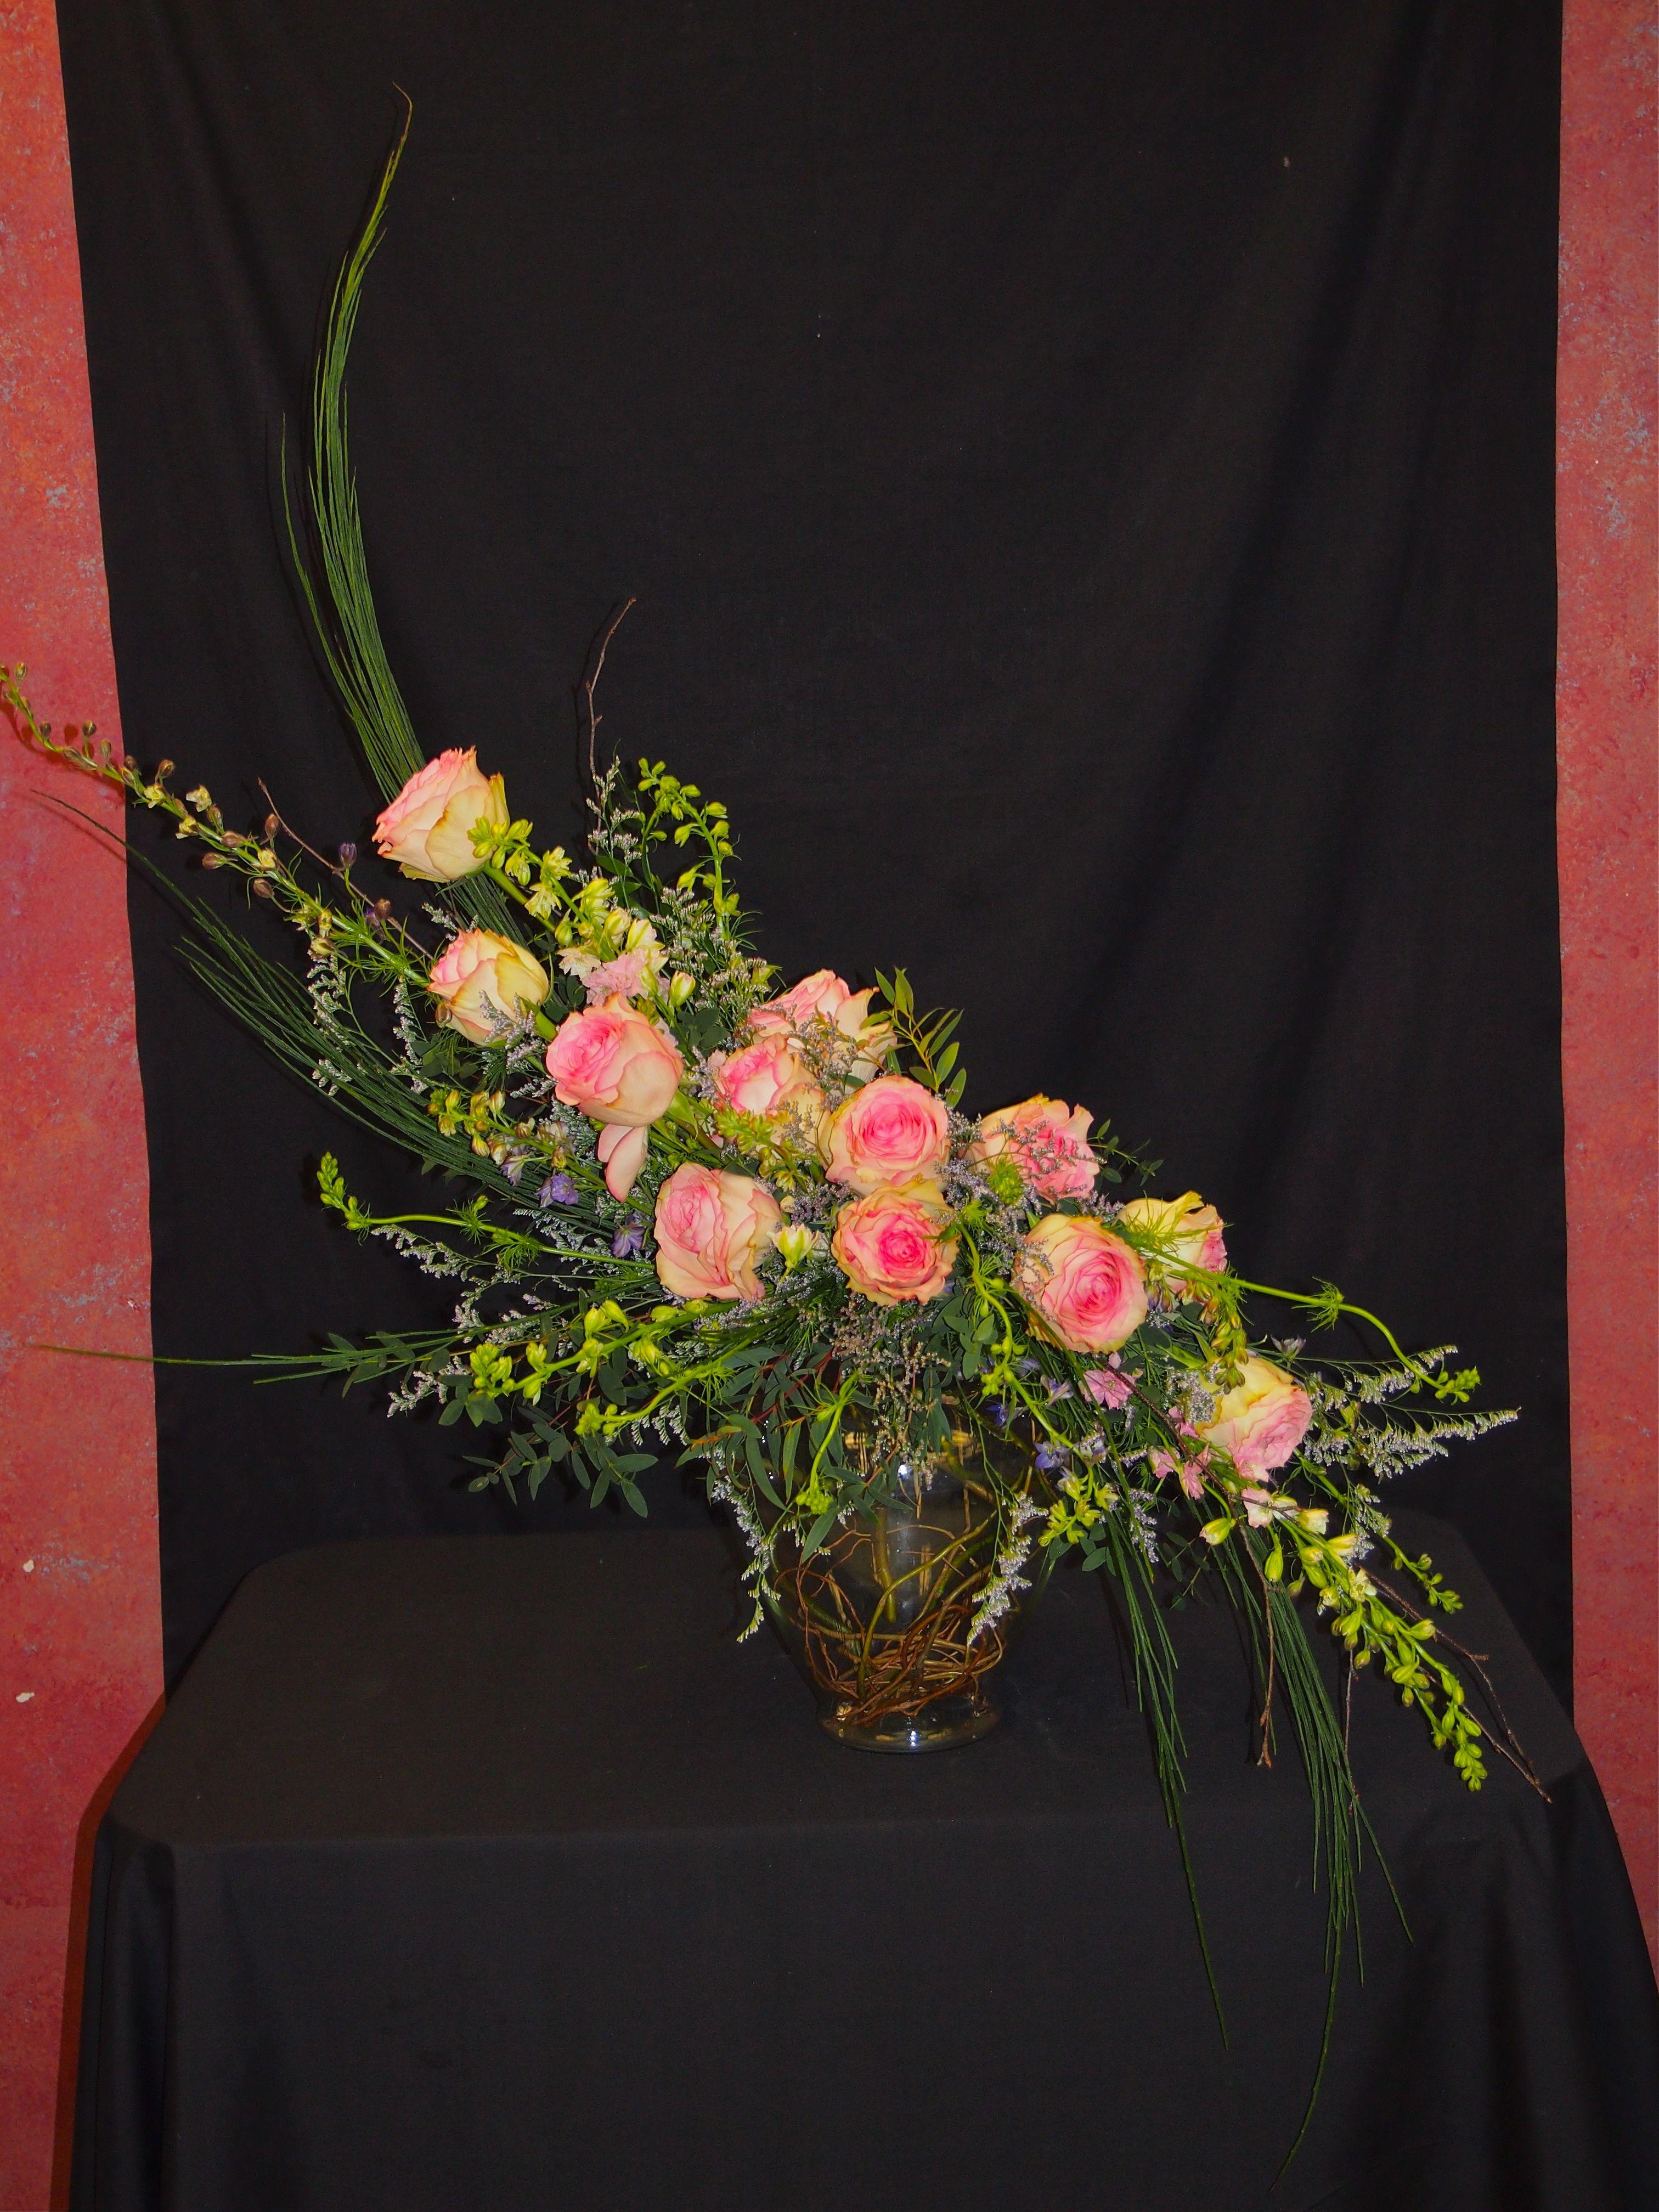 hogarth's curve | flower arrangements | Pinterest